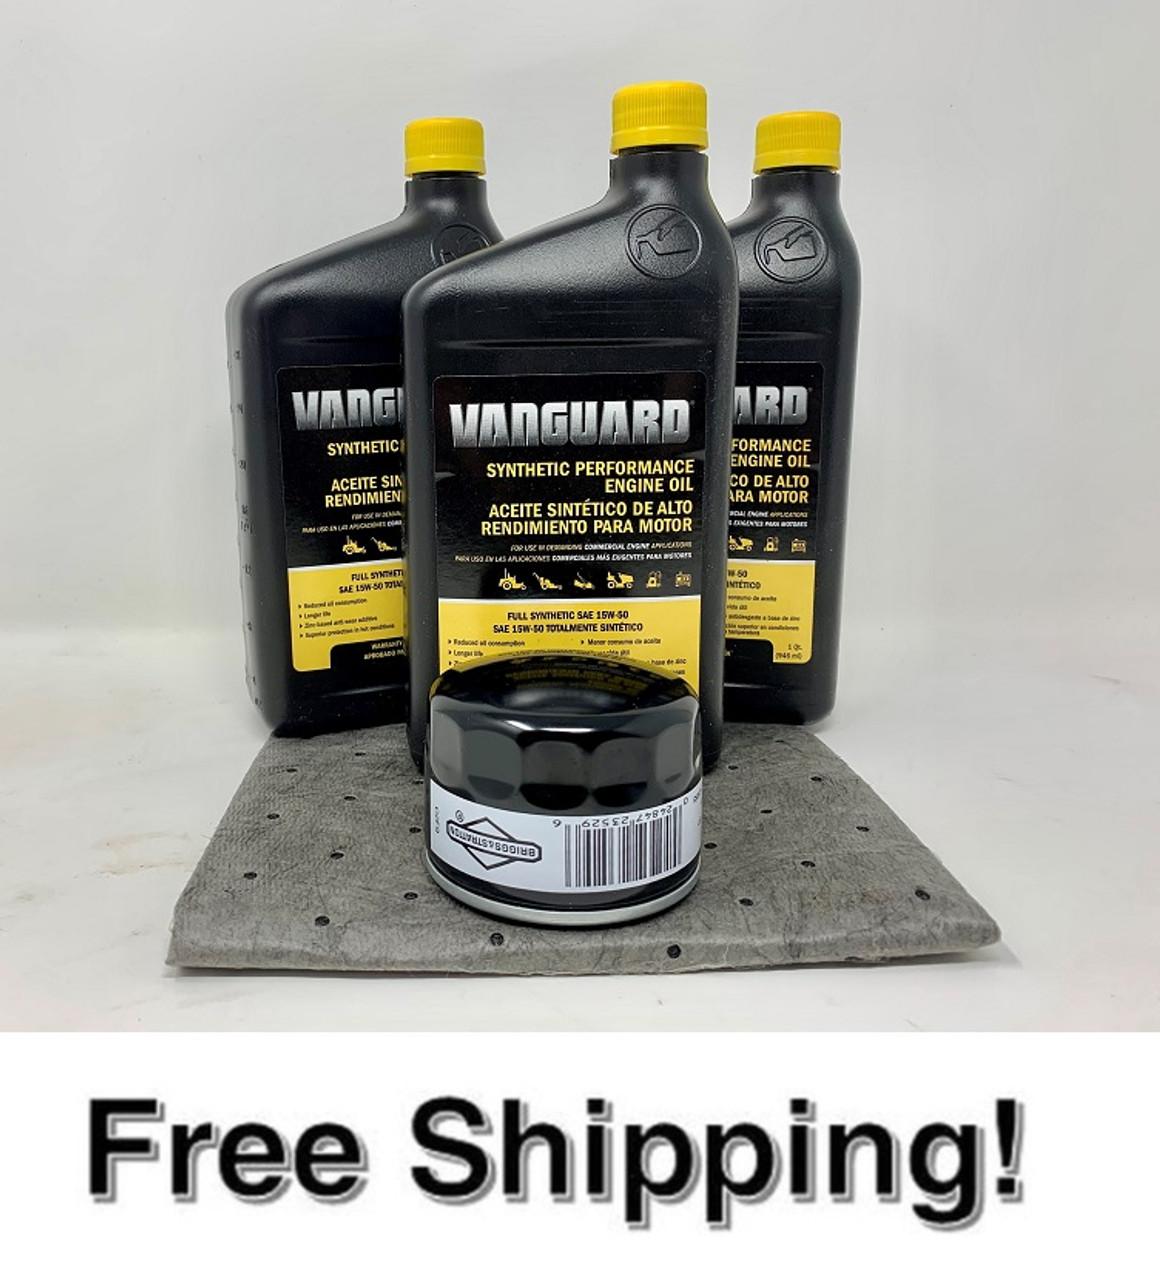 BRIGGS & STRATTON / VANGUARD OIL KIT 28HP - 36HP